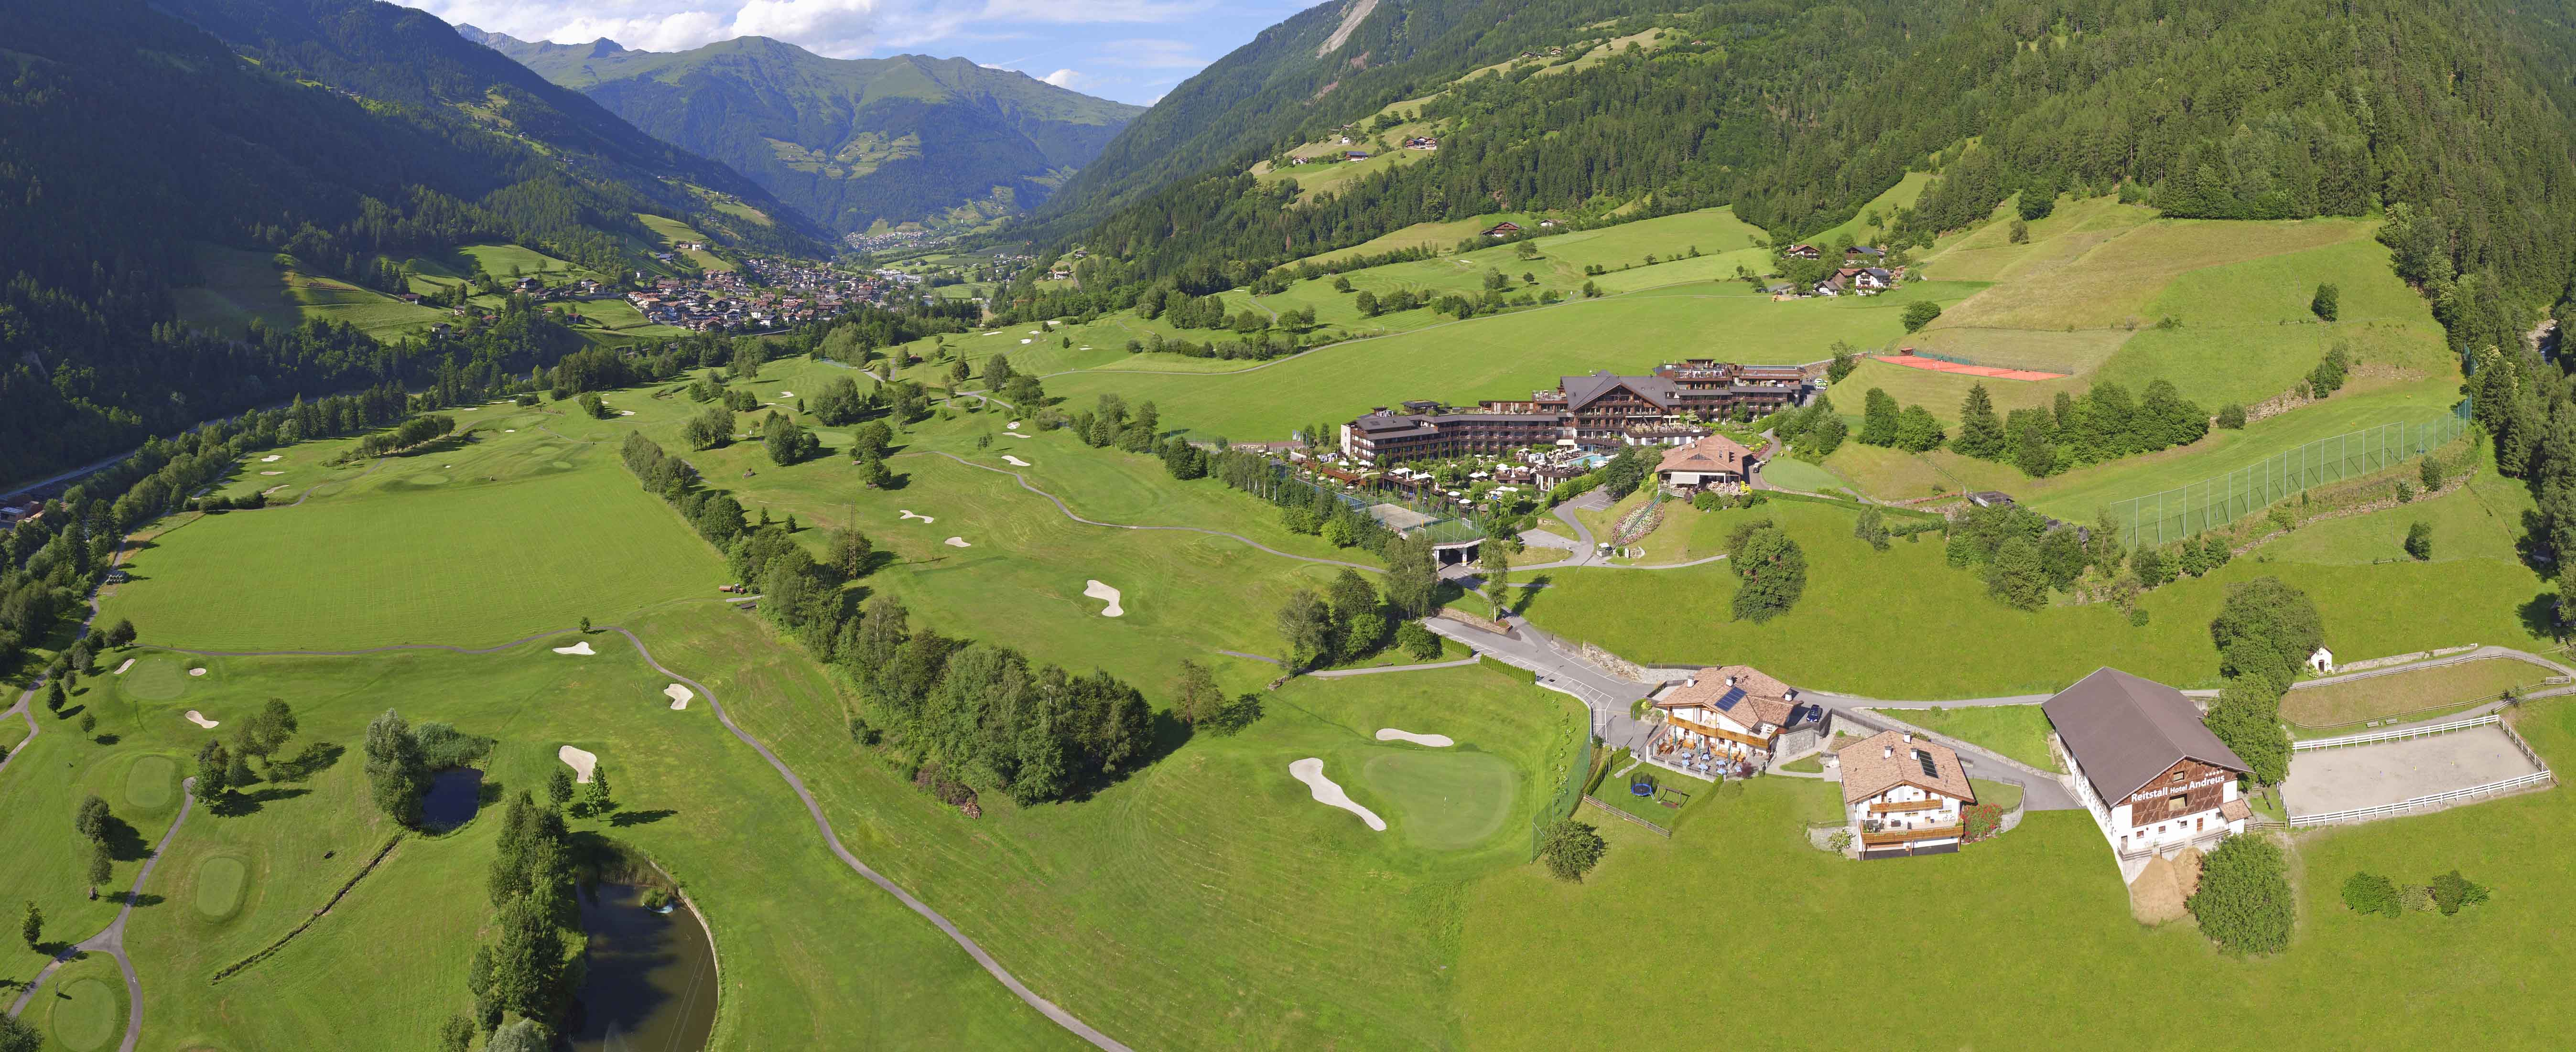 Hotel andreus 5 sterne luxus wellnesshotel golfhotel for Design wellnesshotel sudtirol